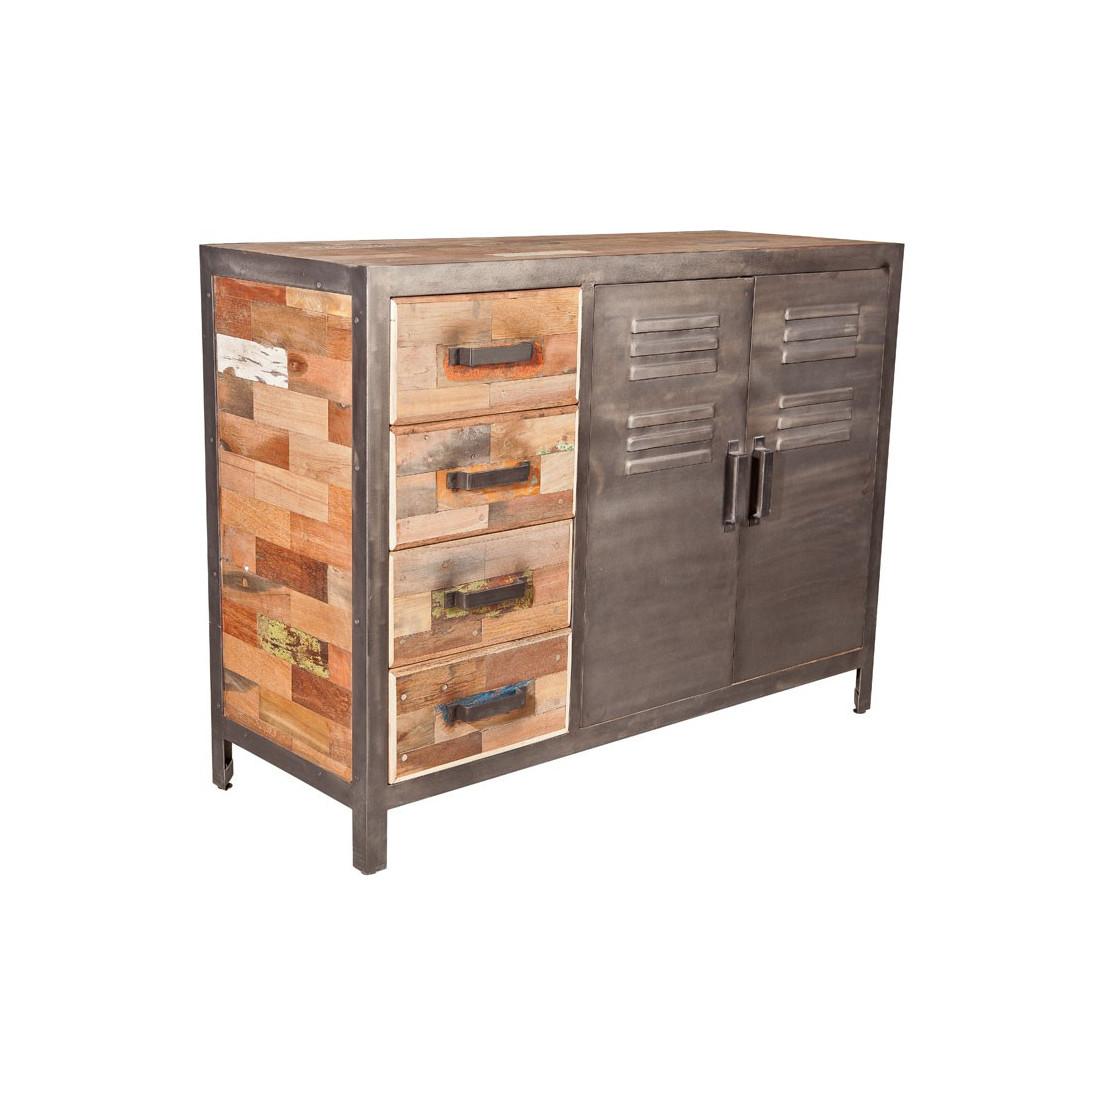 Buffet 2 portes 4 tiroirs bois fer fabrik n 2 univers salle manger - Buffet 2 portes 2 tiroirs ...